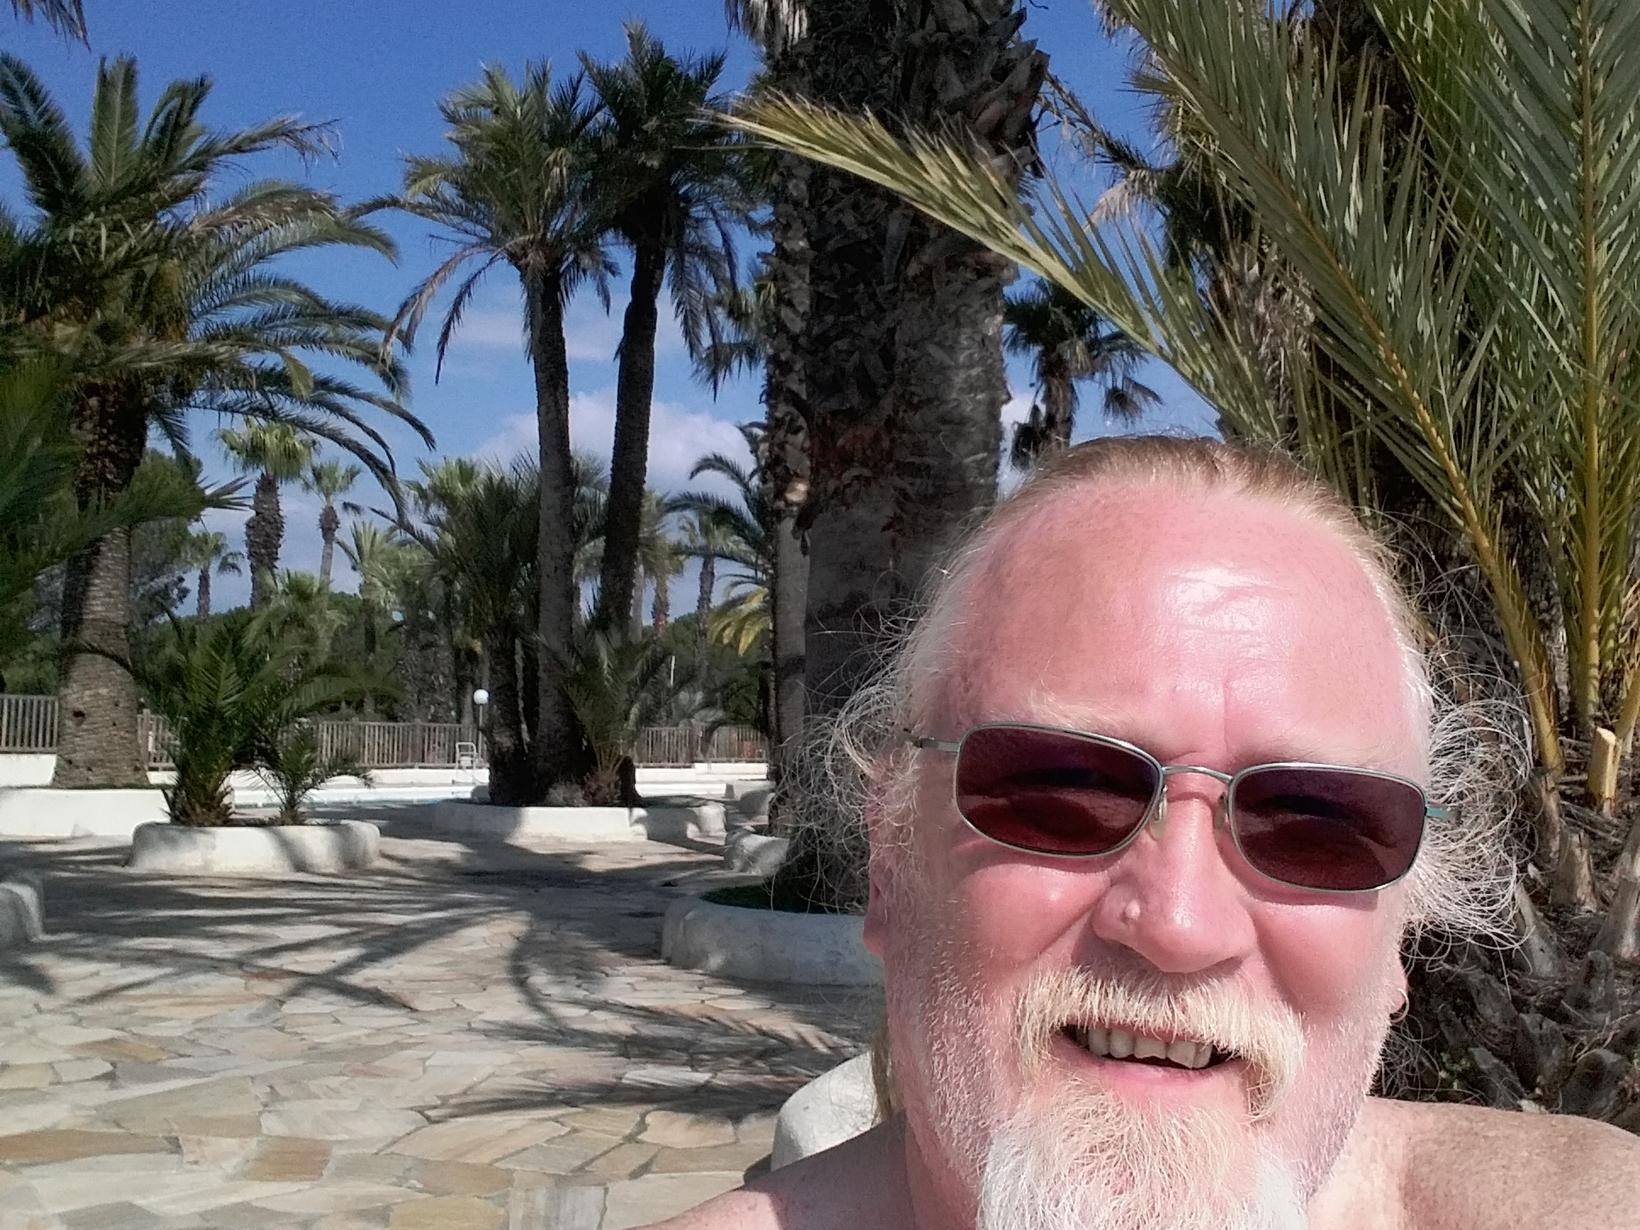 Richard w from Bromsgrove, United Kingdom